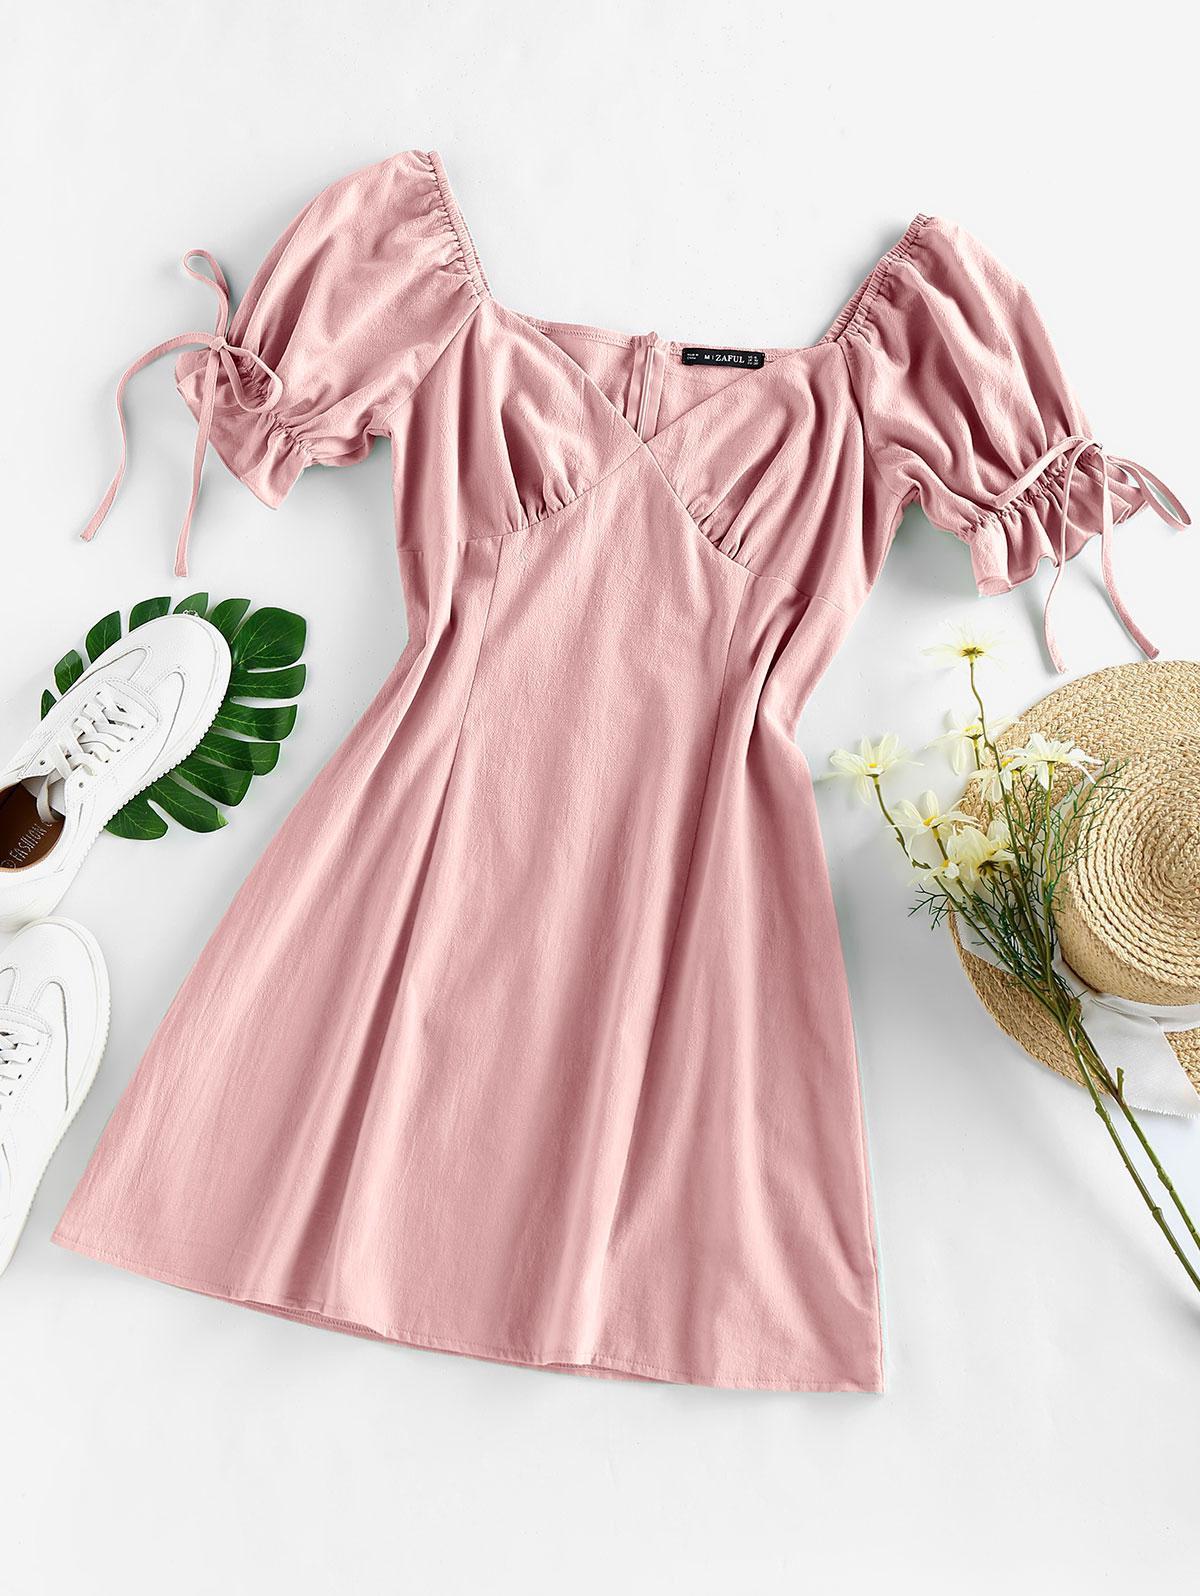 ZAFUL Puff Sleeve Ruffle Bowknot Mini Dress